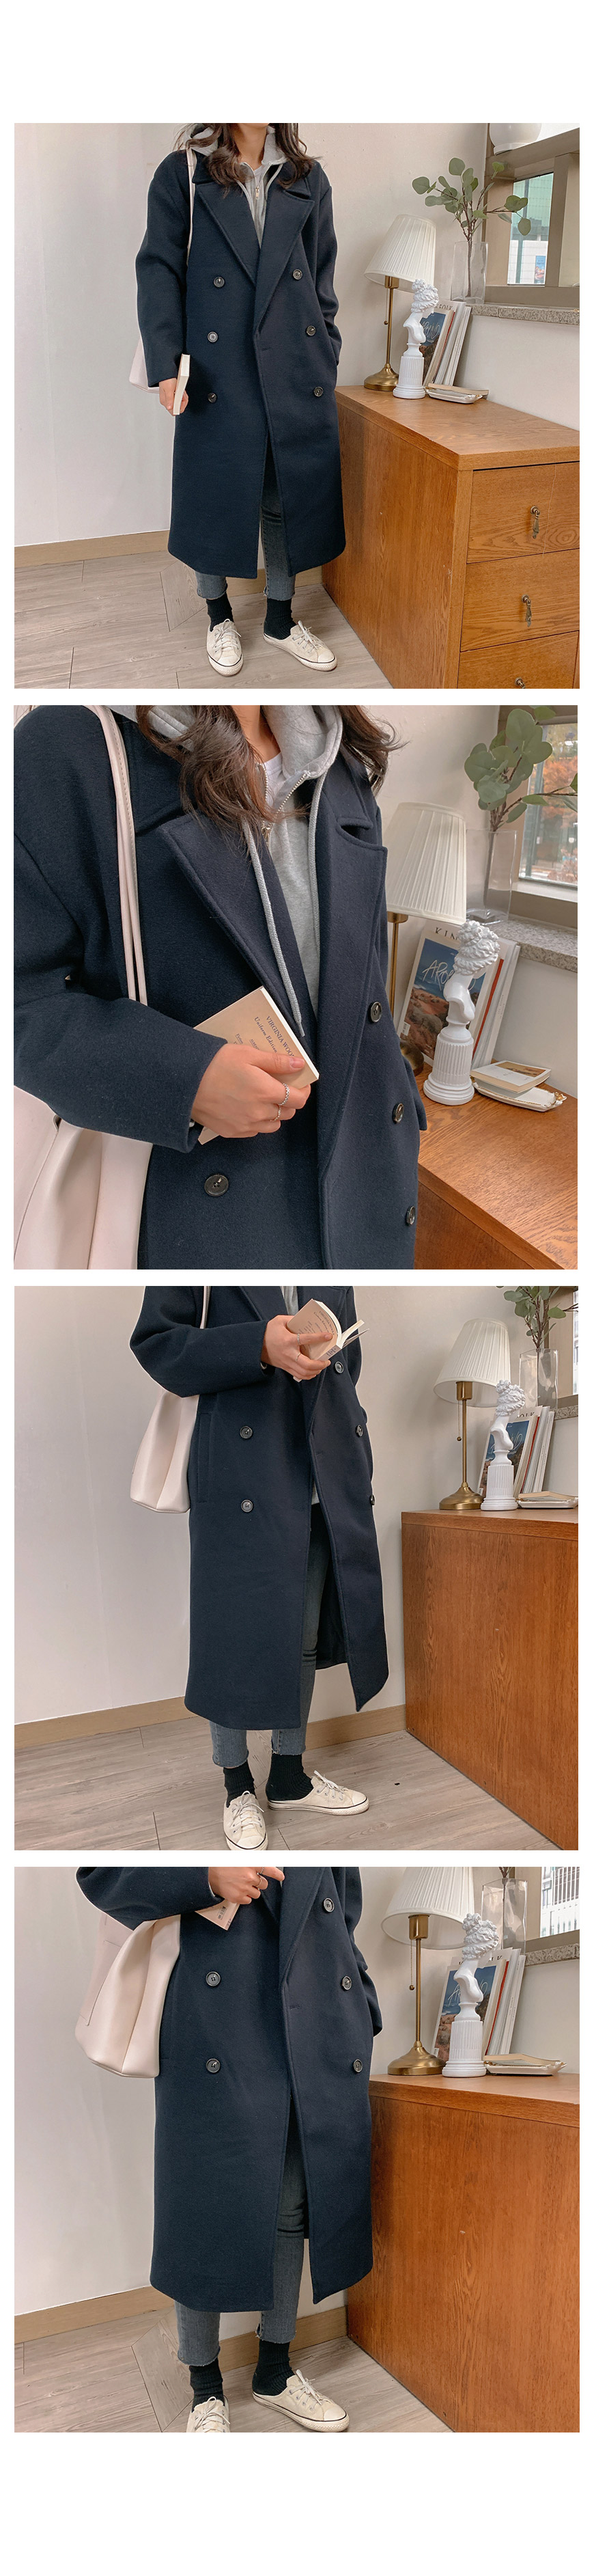 Daily brushed hood zip up jumper-2color